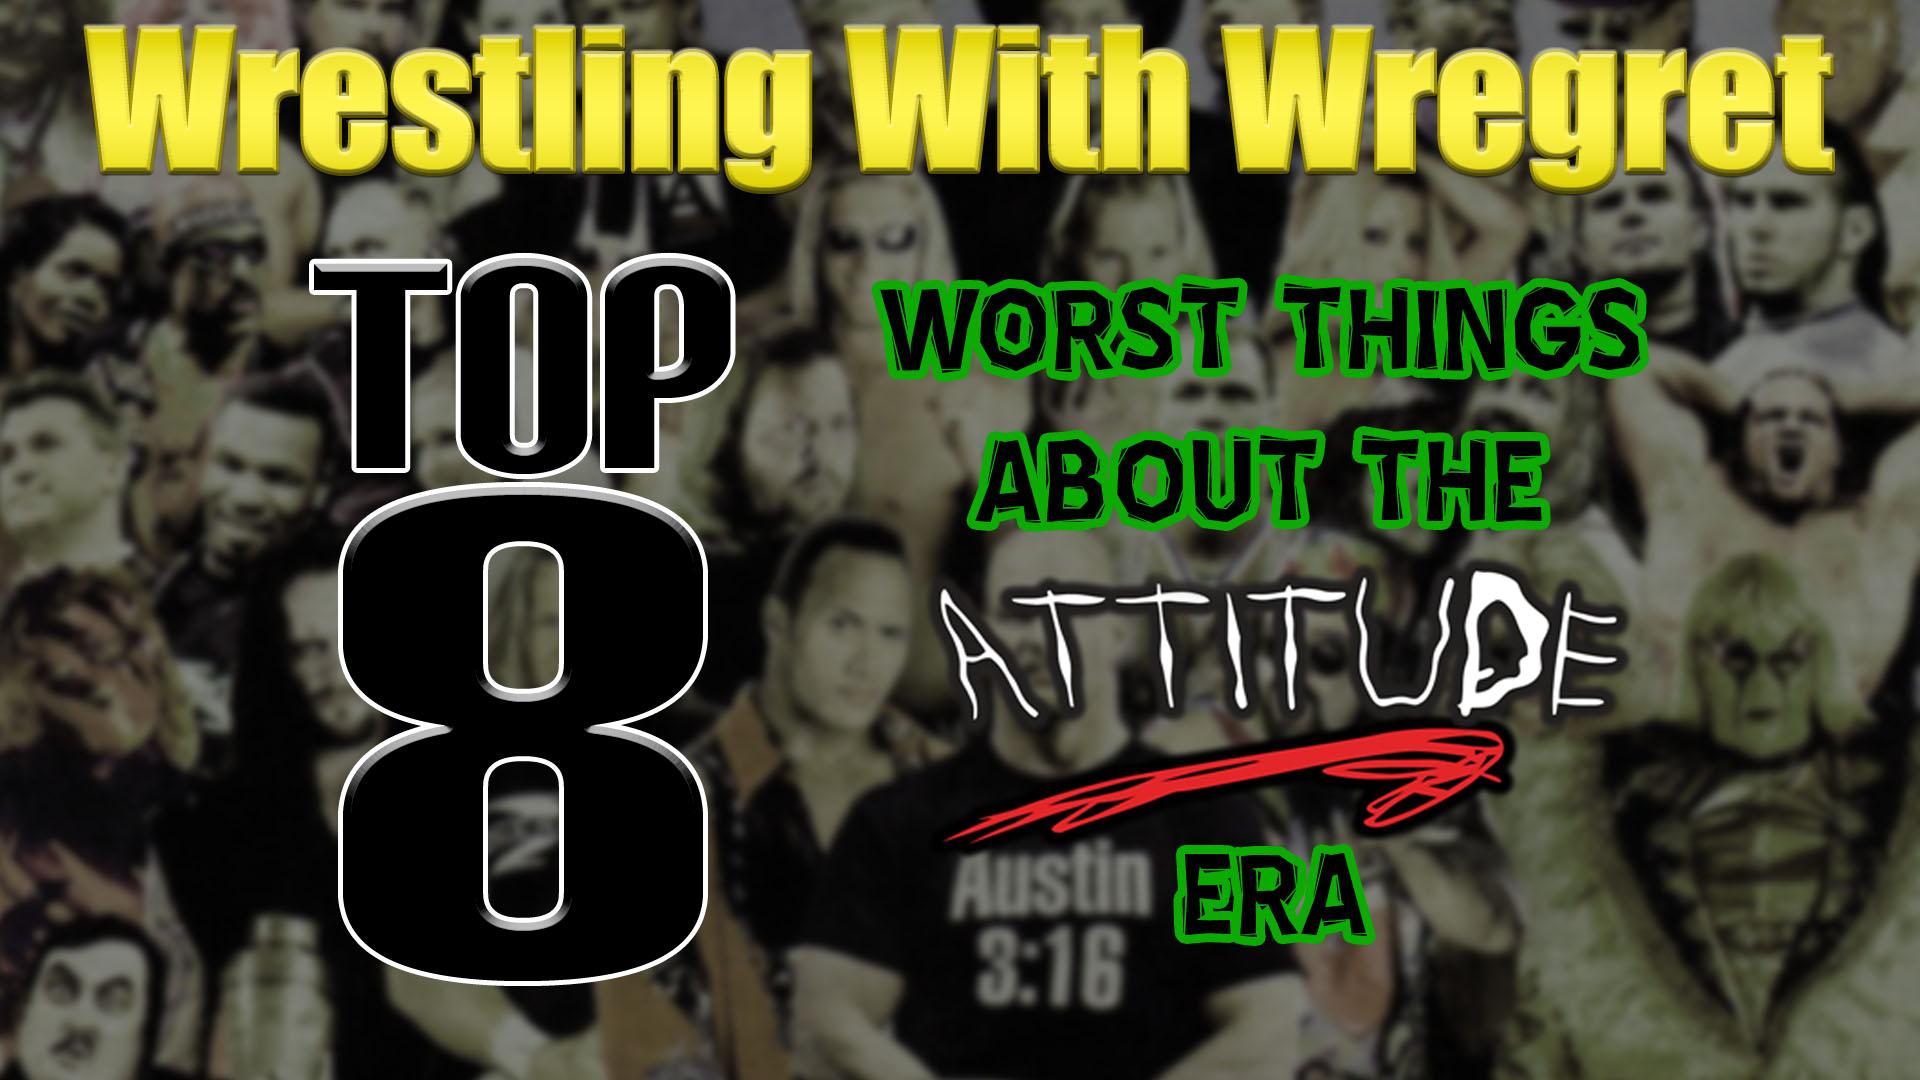 WrestlingWithWregret-Top8WorstThingsAboutTheAttitudeEra717